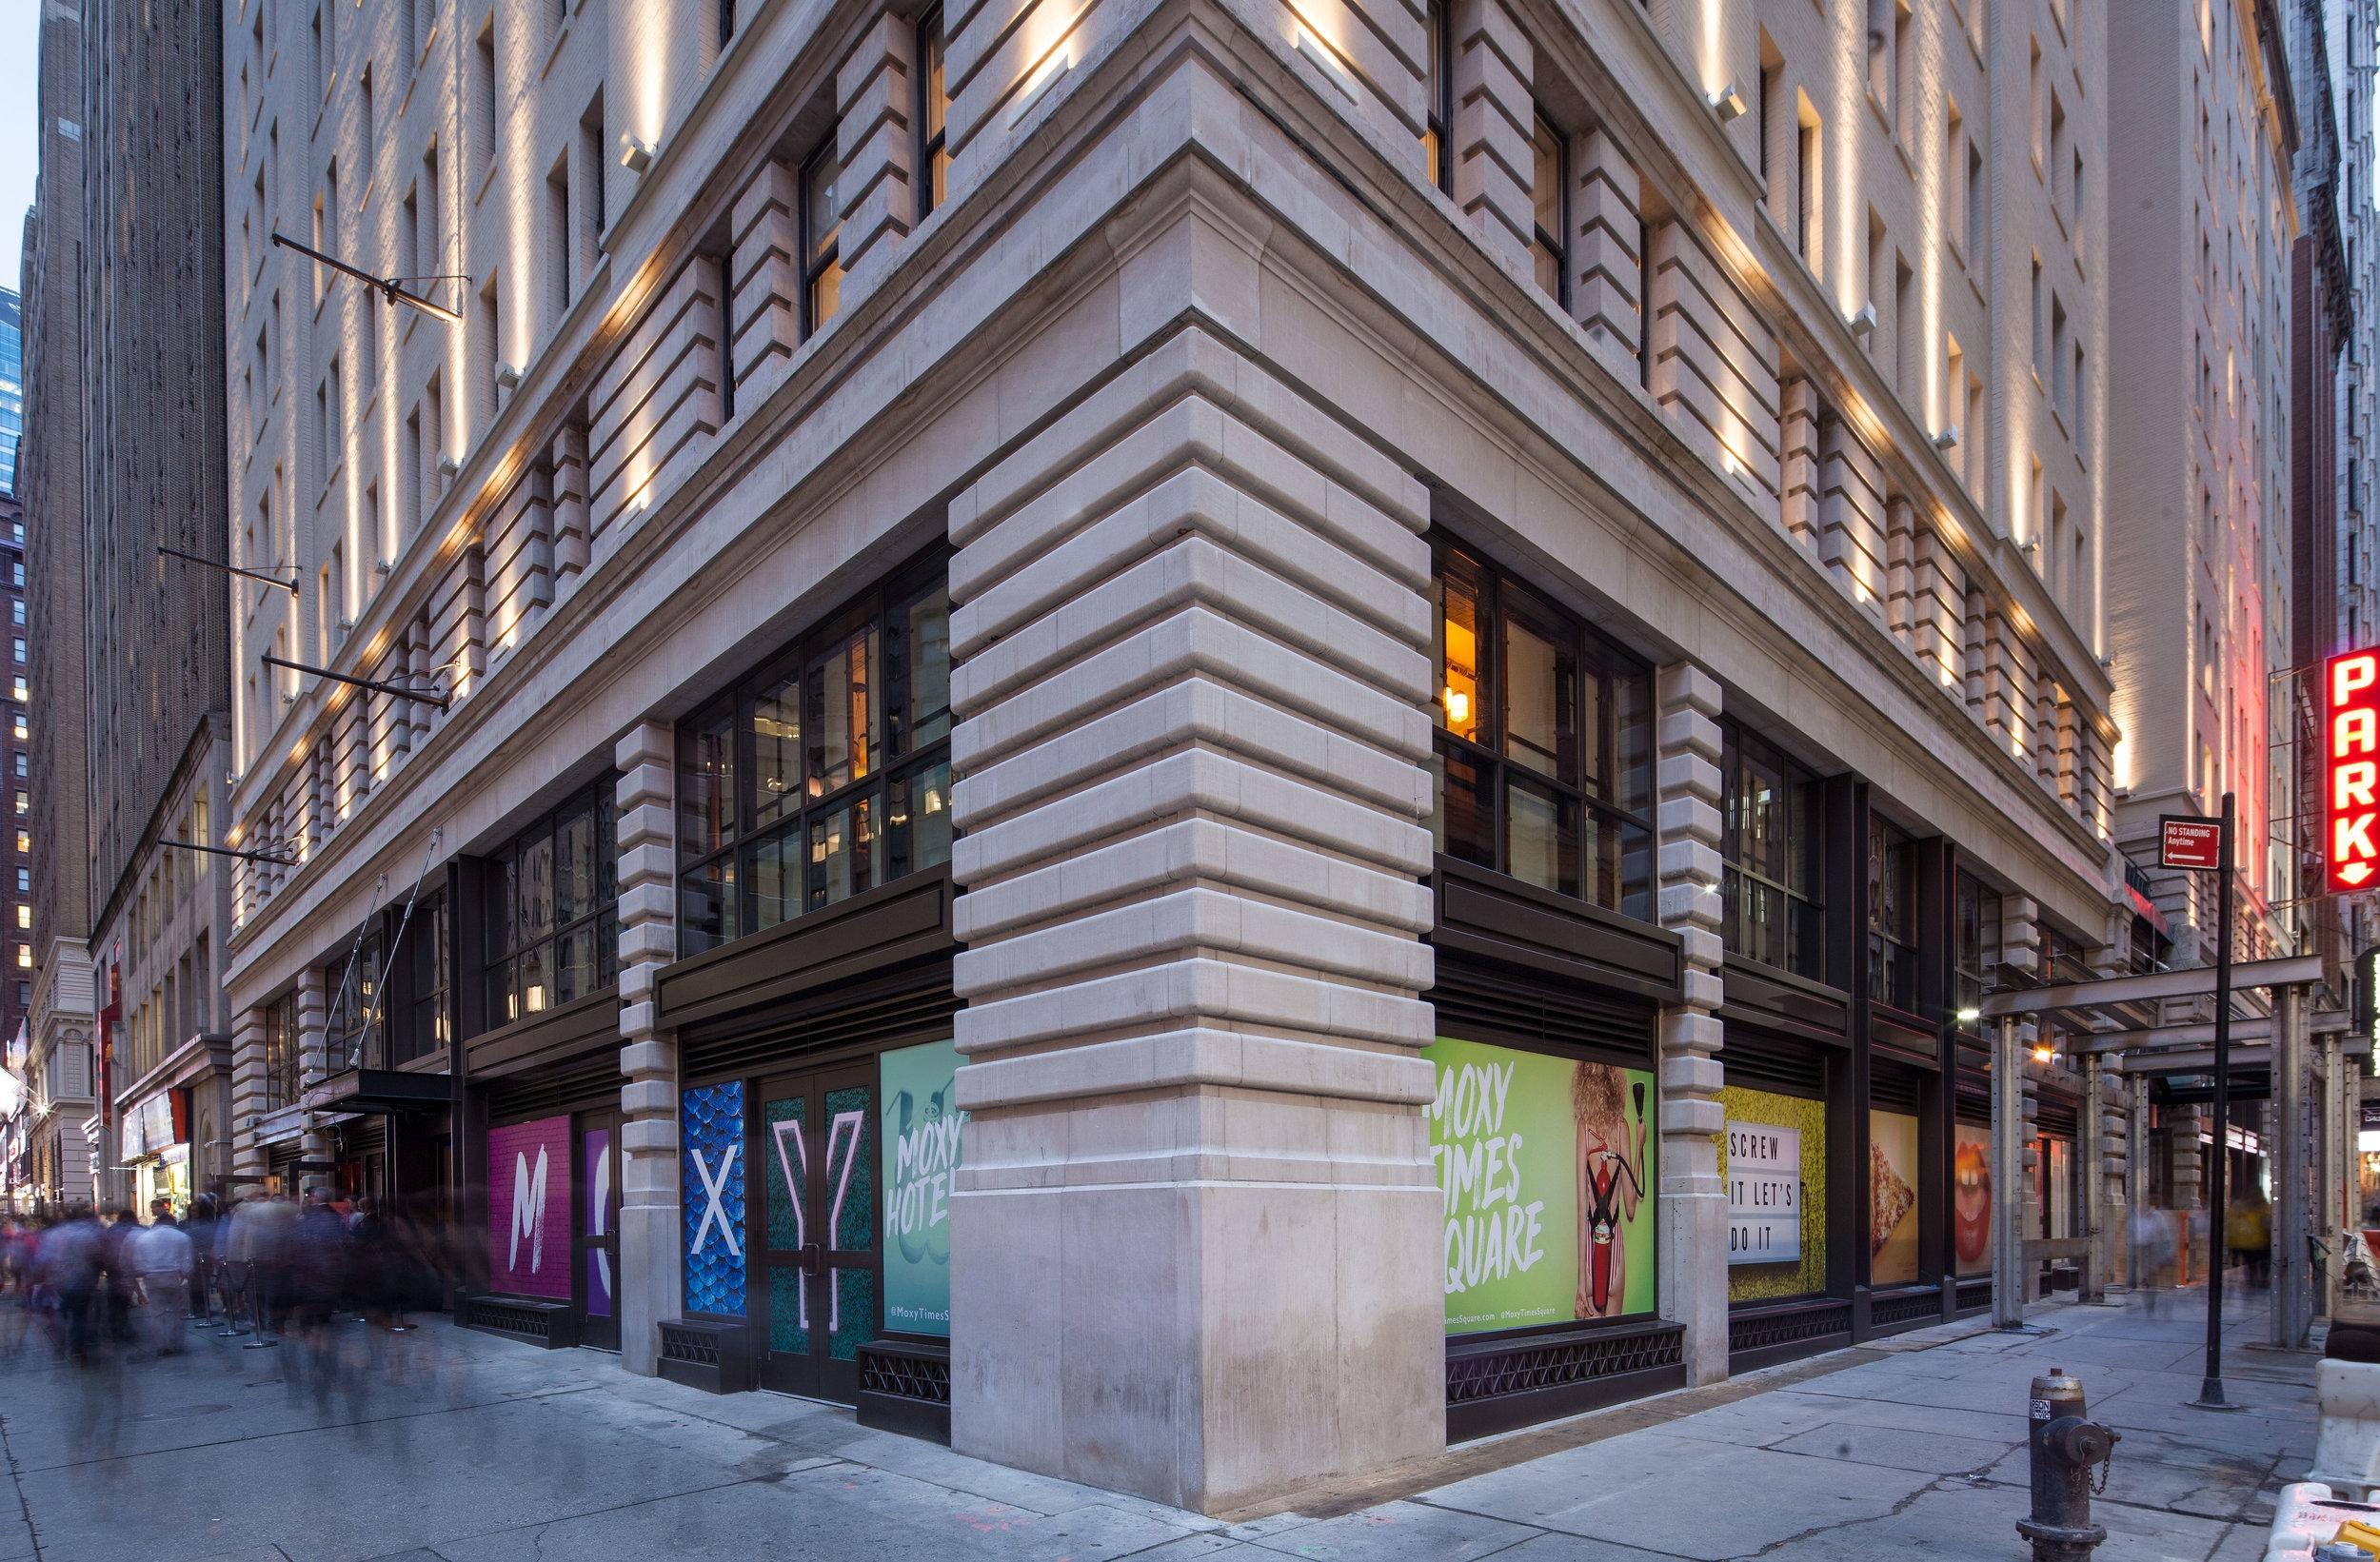 Moxy-Times-Square-Exterior-2.jpg